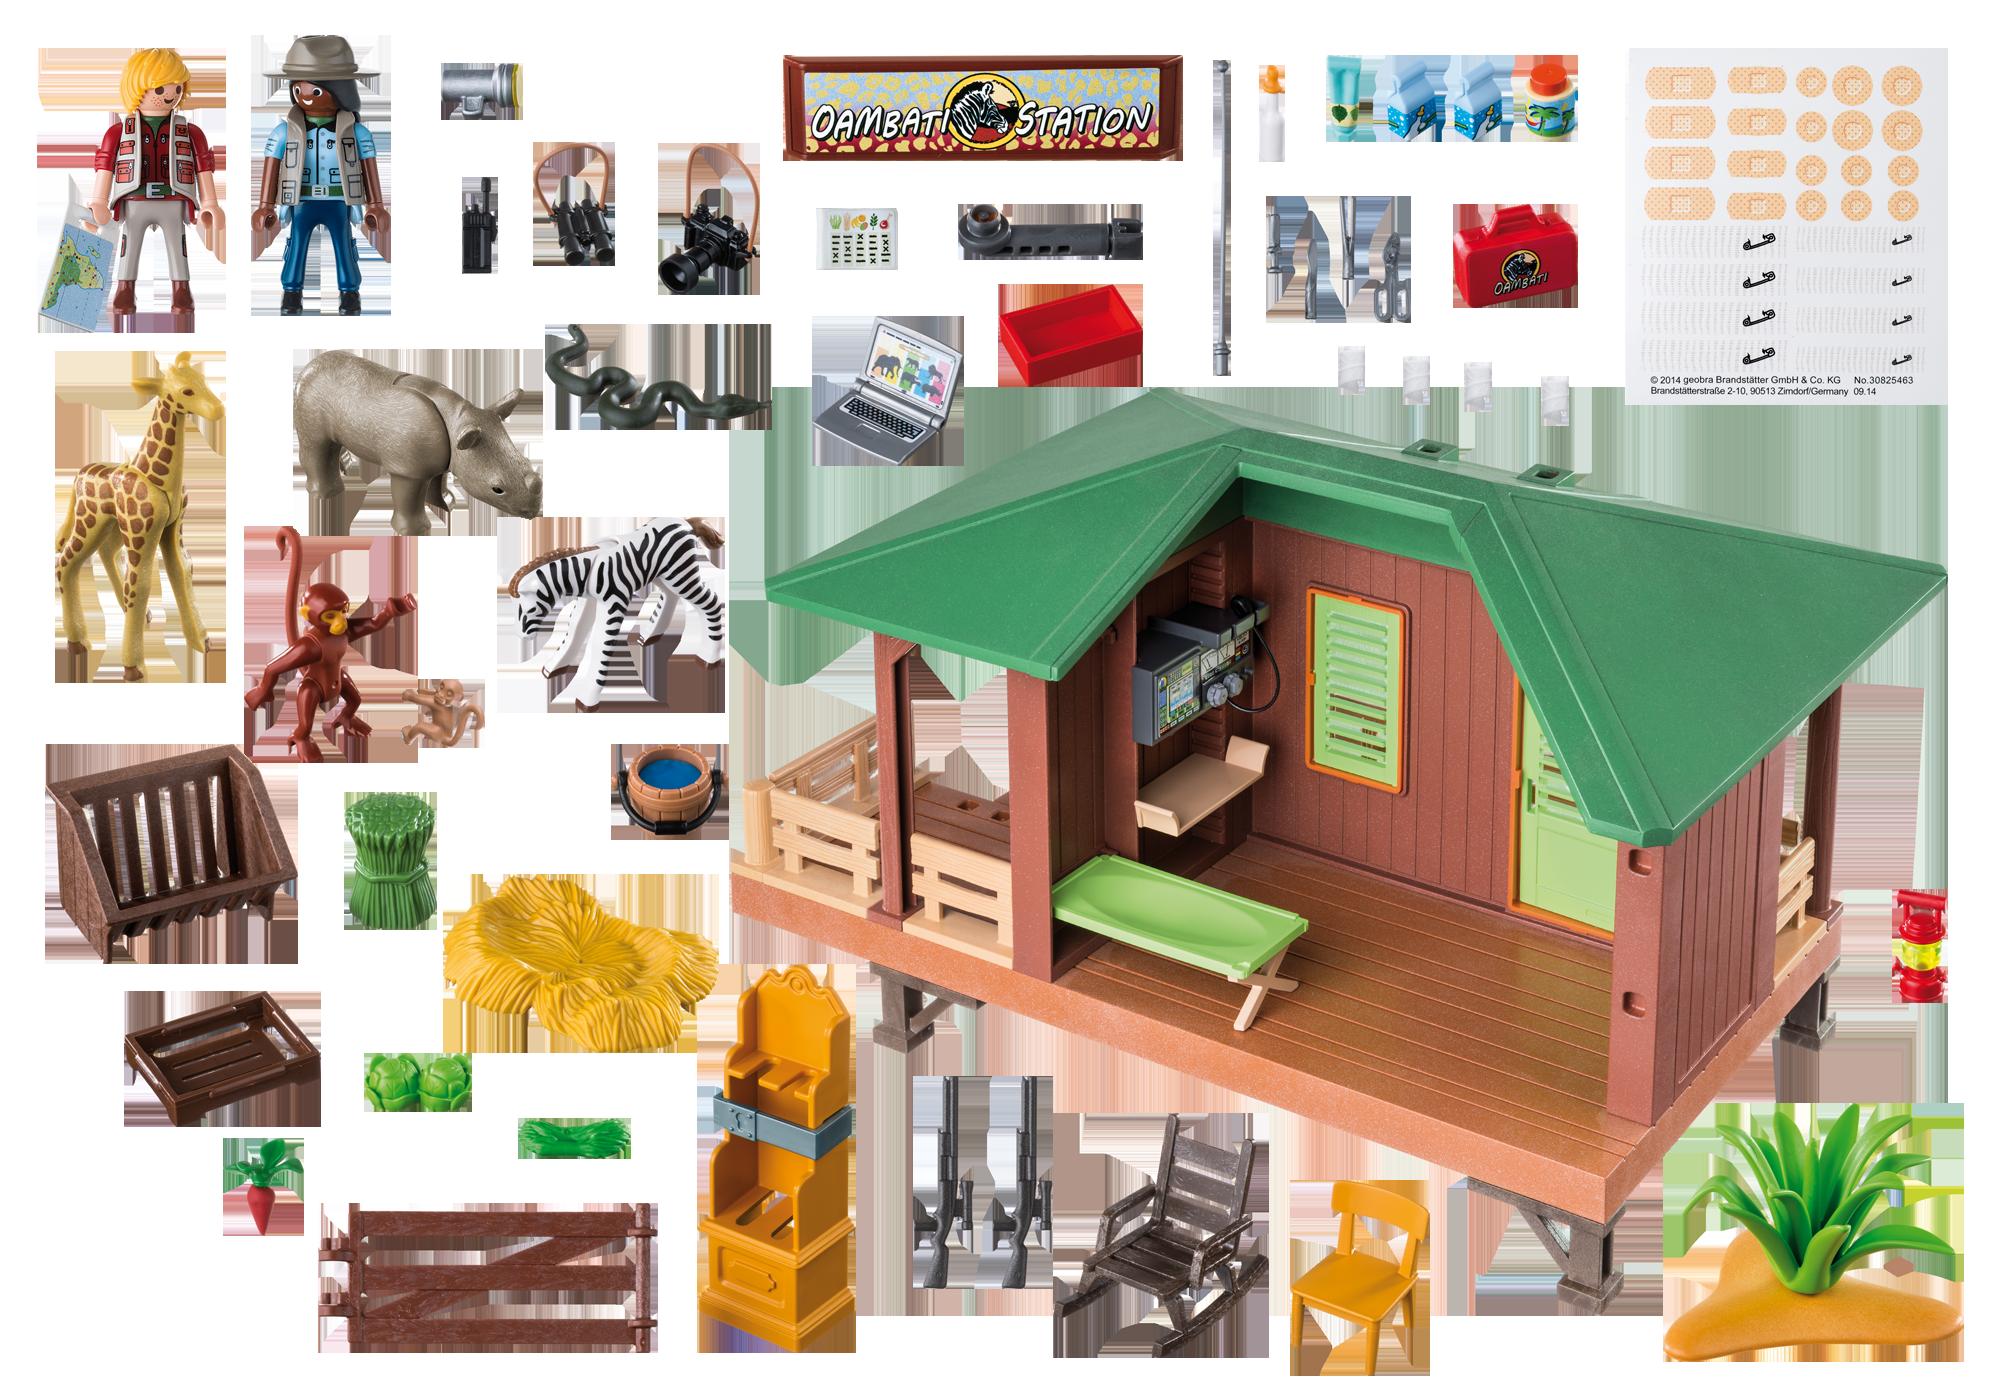 http://media.playmobil.com/i/playmobil/6936_product_box_back/Ranger Station with Animal Area